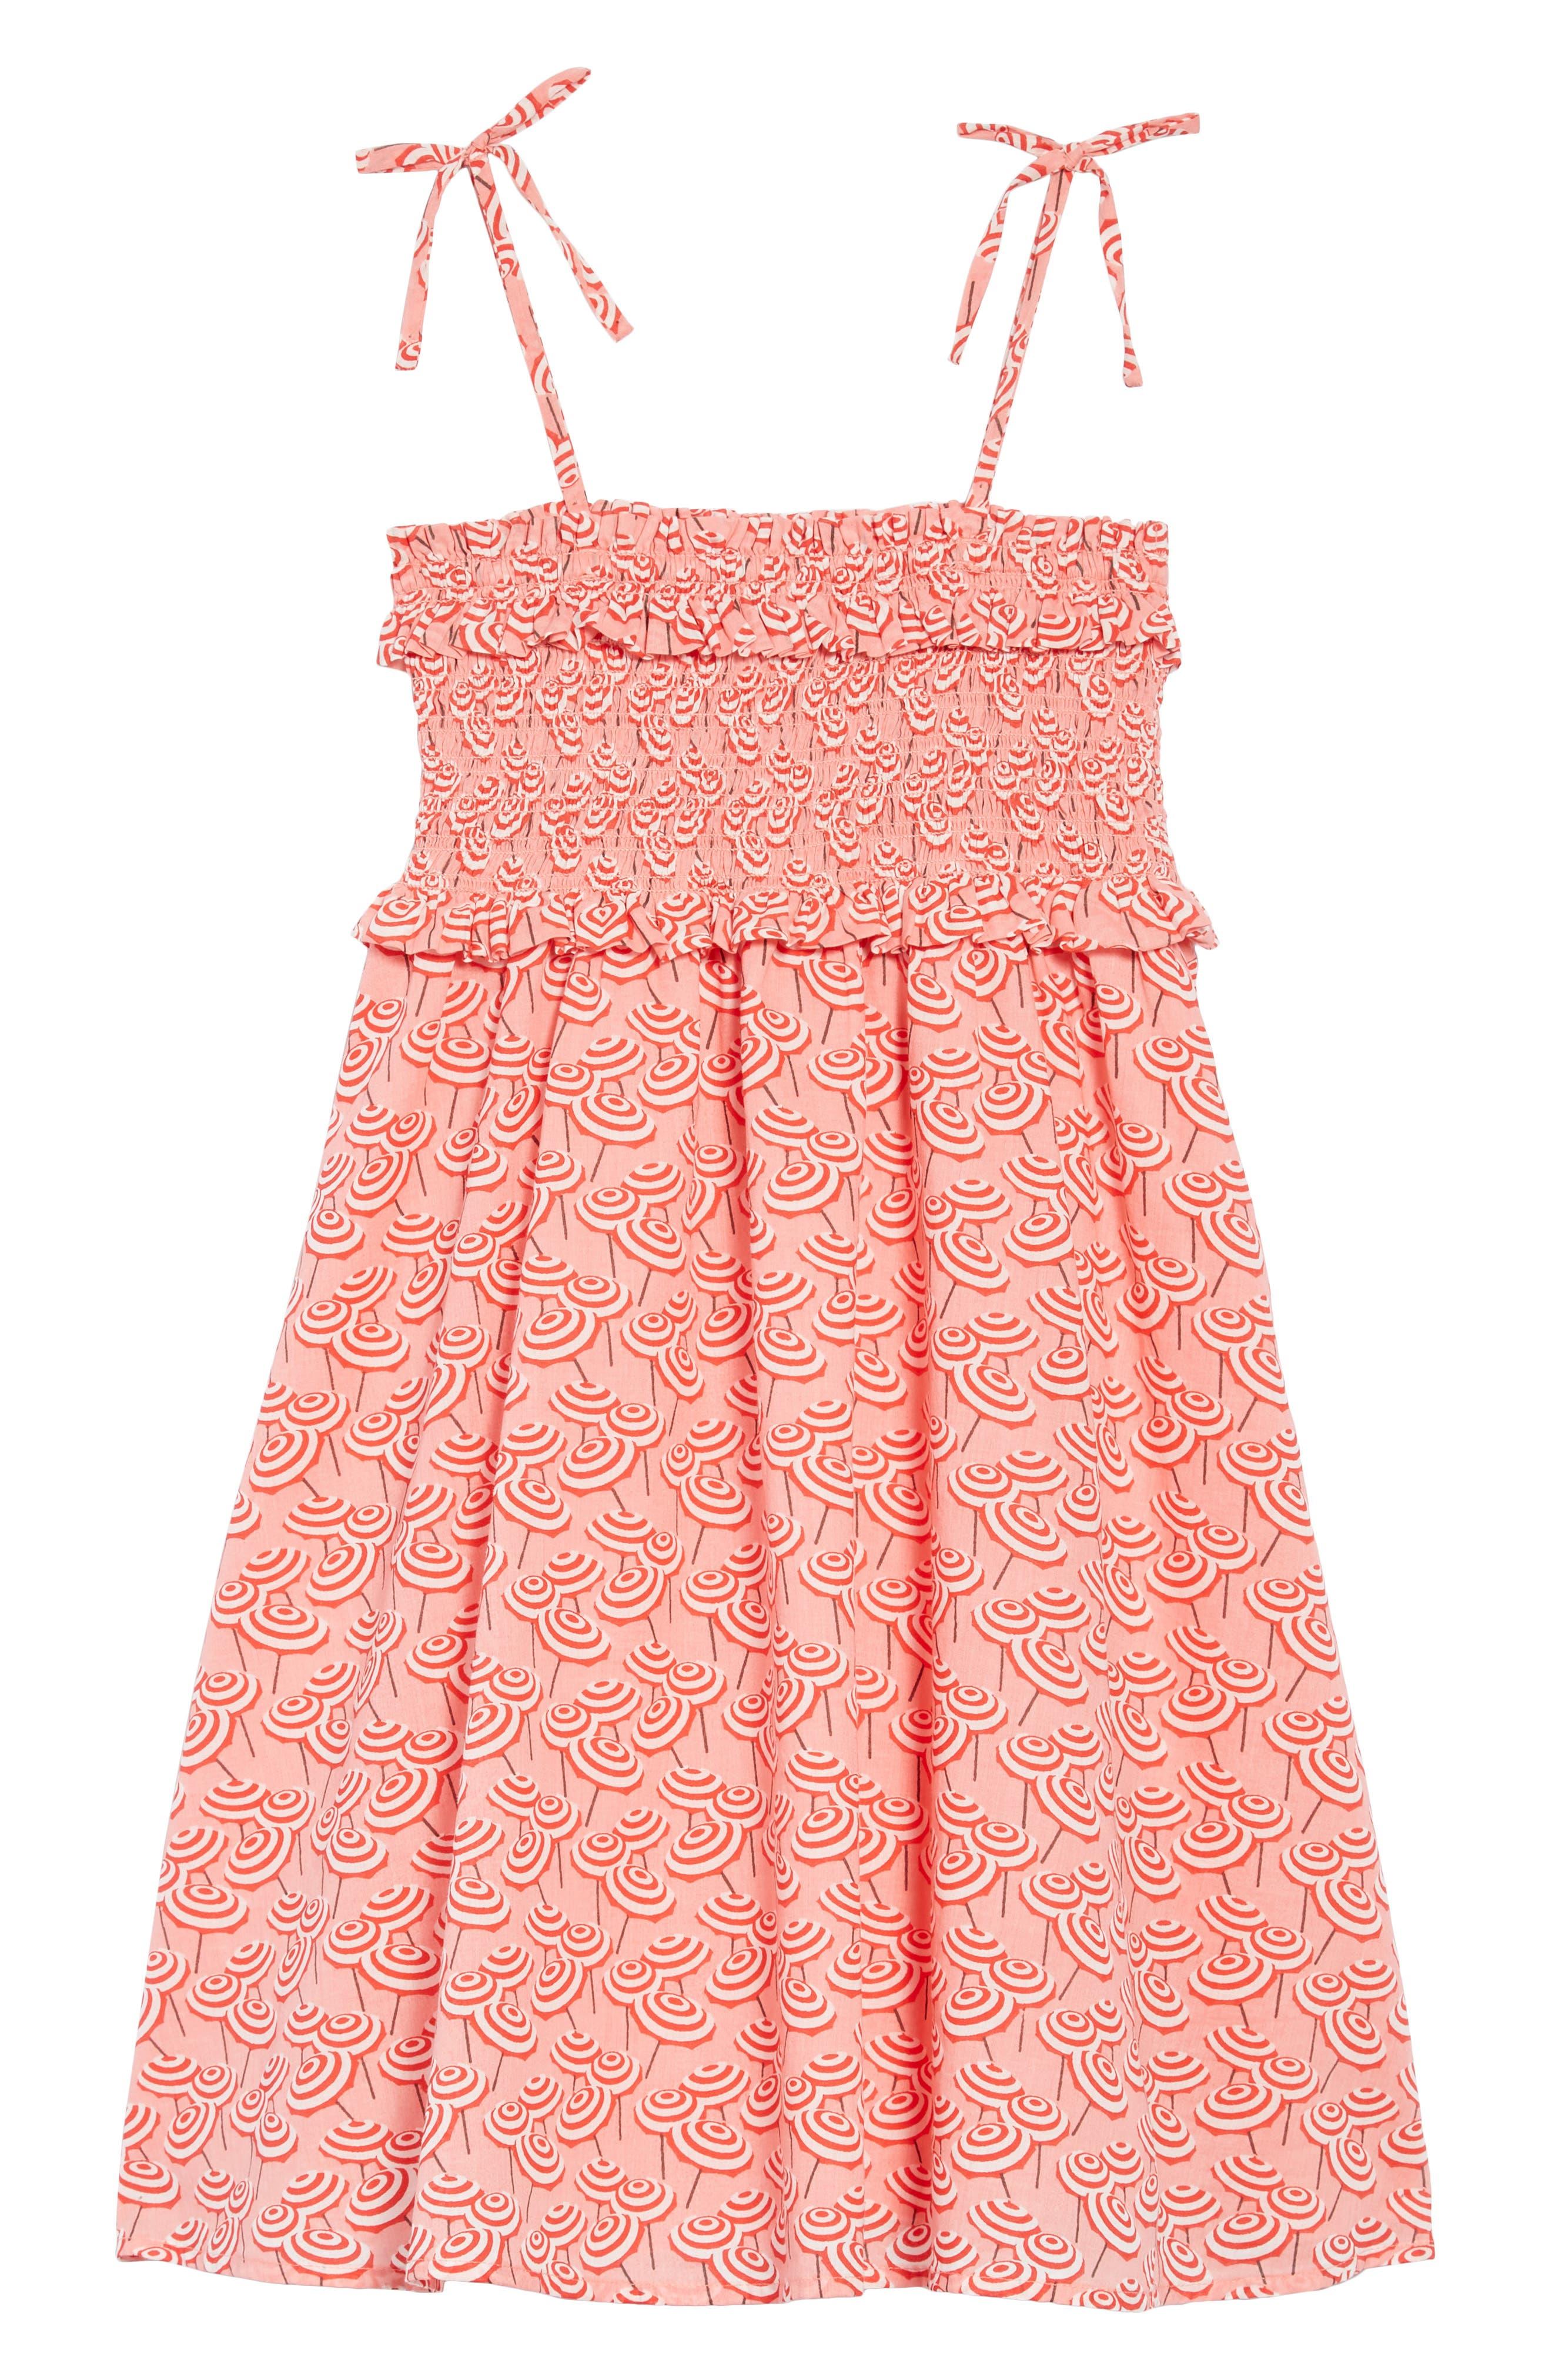 Umbrella Print Smocked Bodice Dress,                         Main,                         color, 600